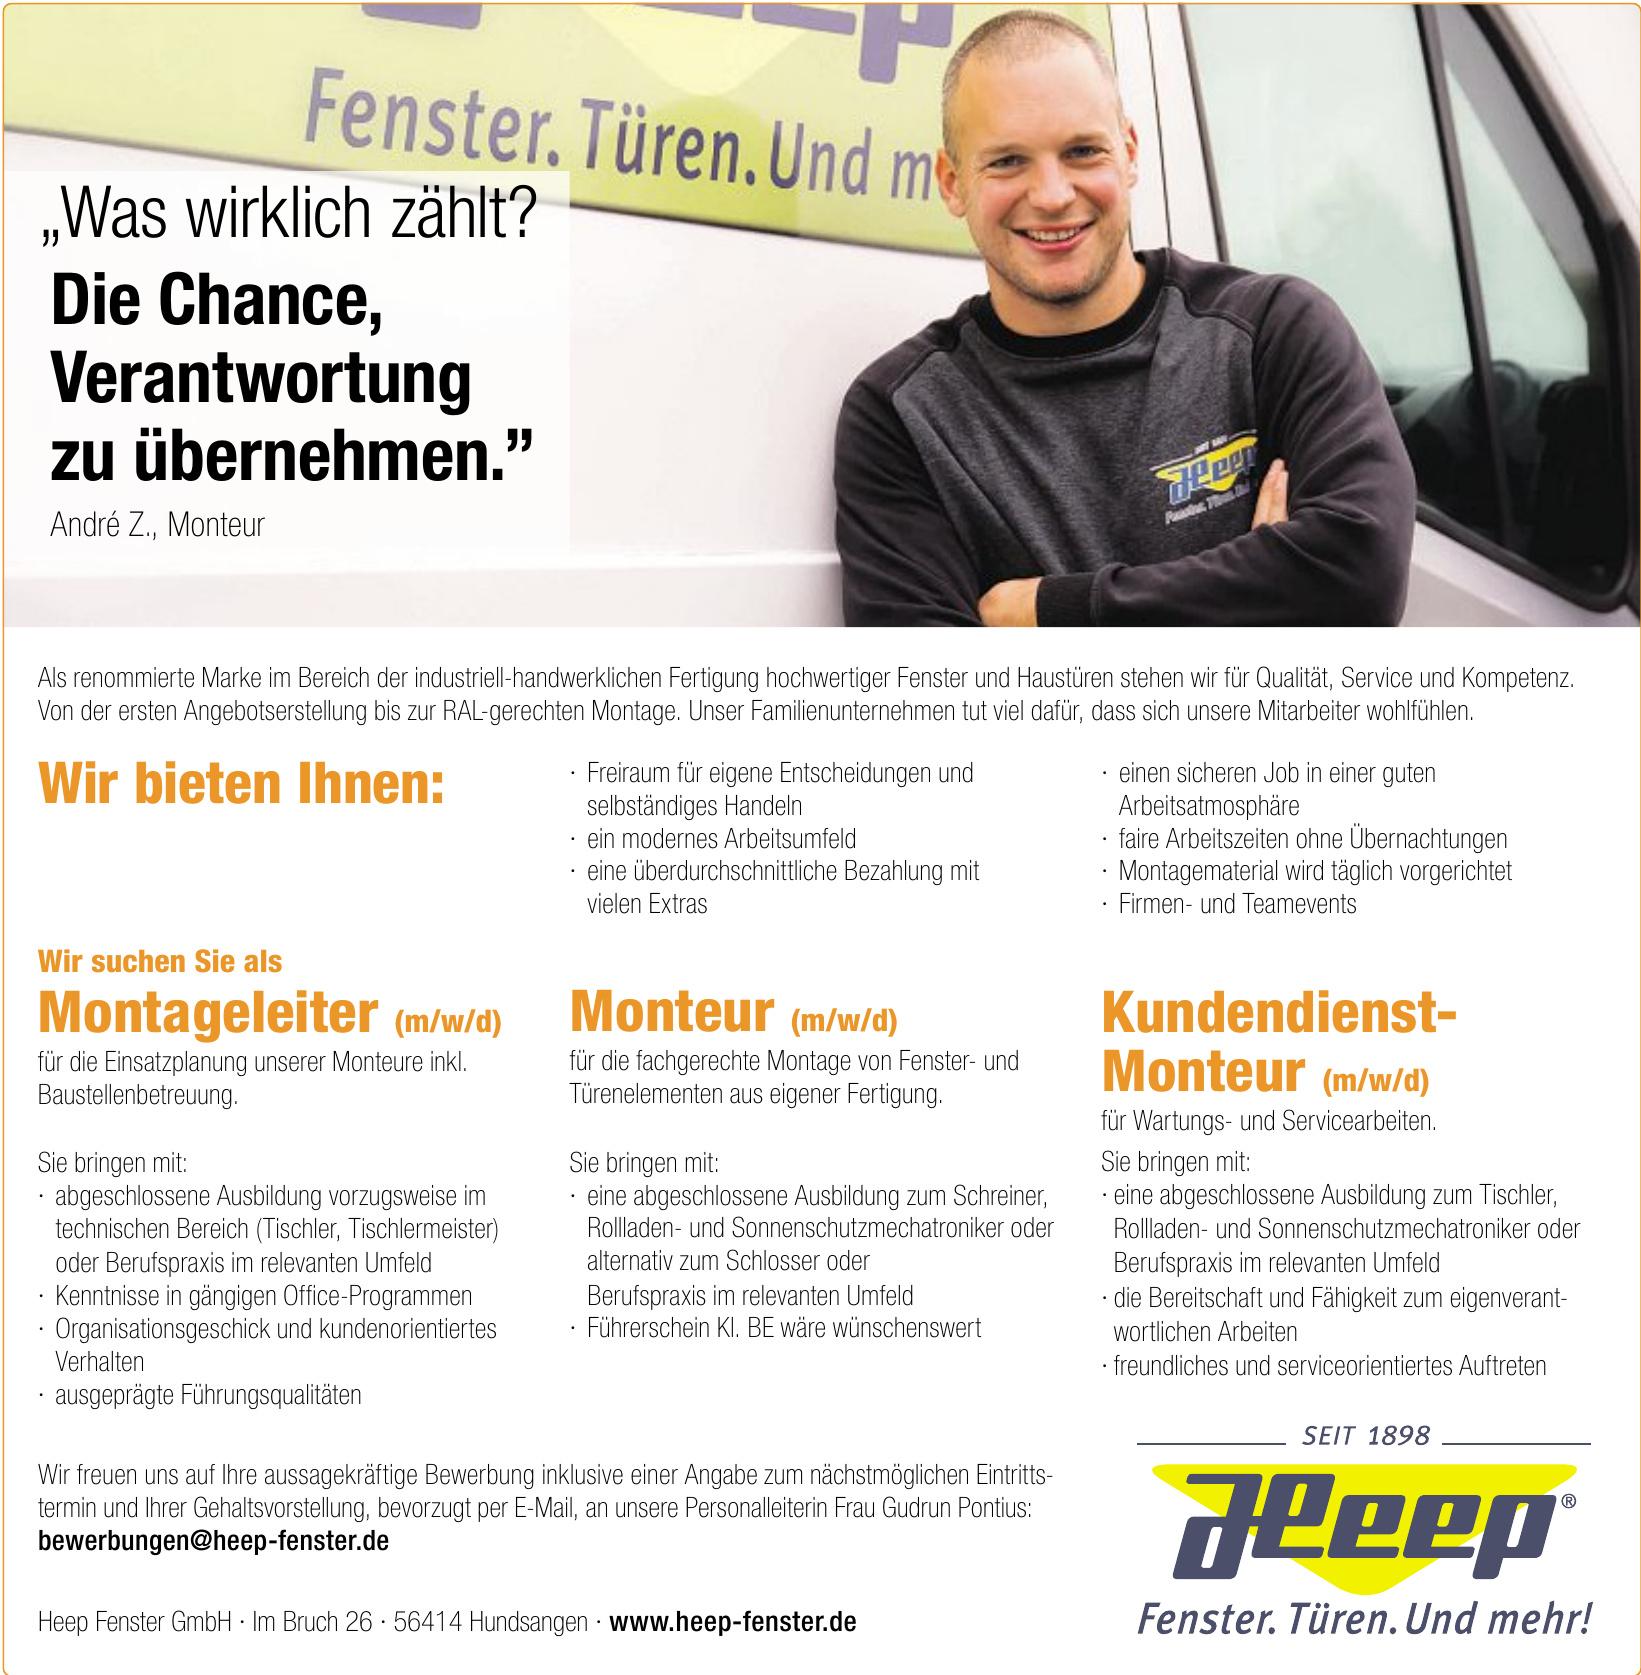 Heep Fenster GmbH